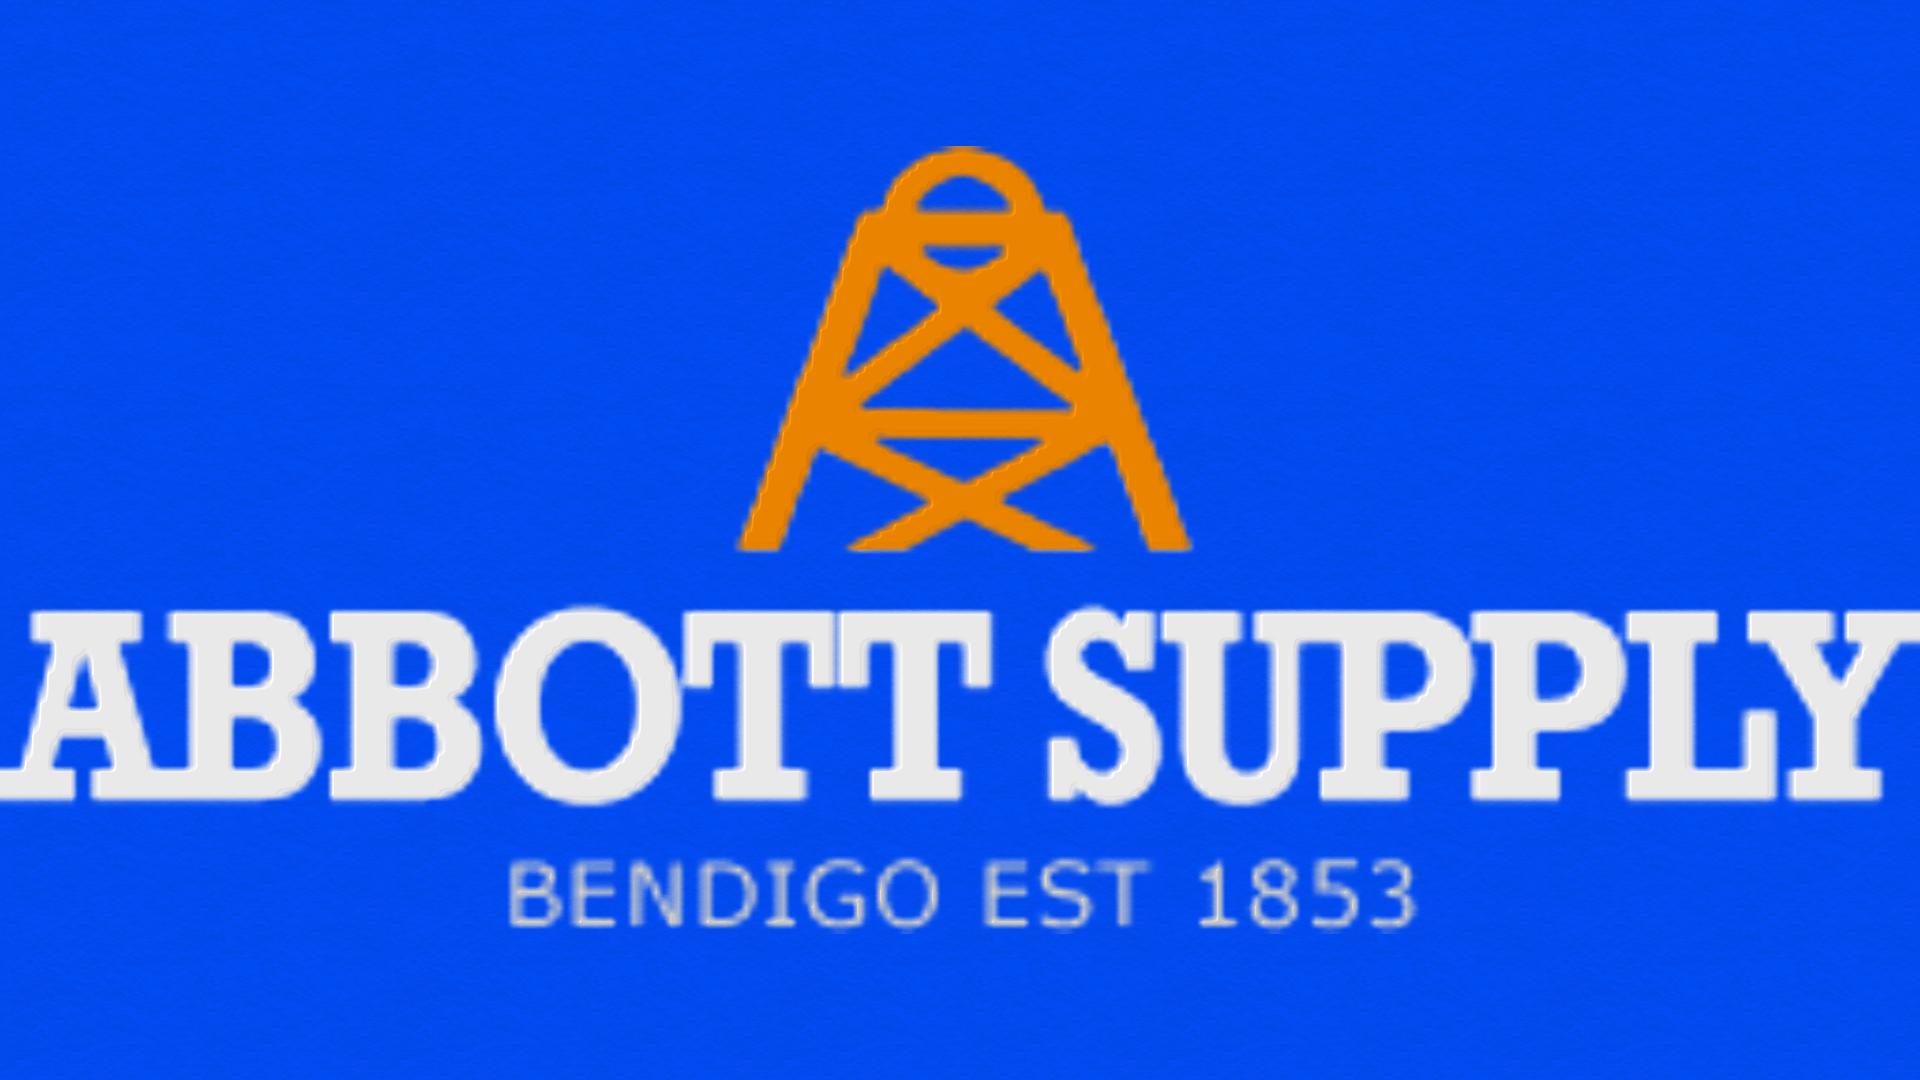 Abbott Supply